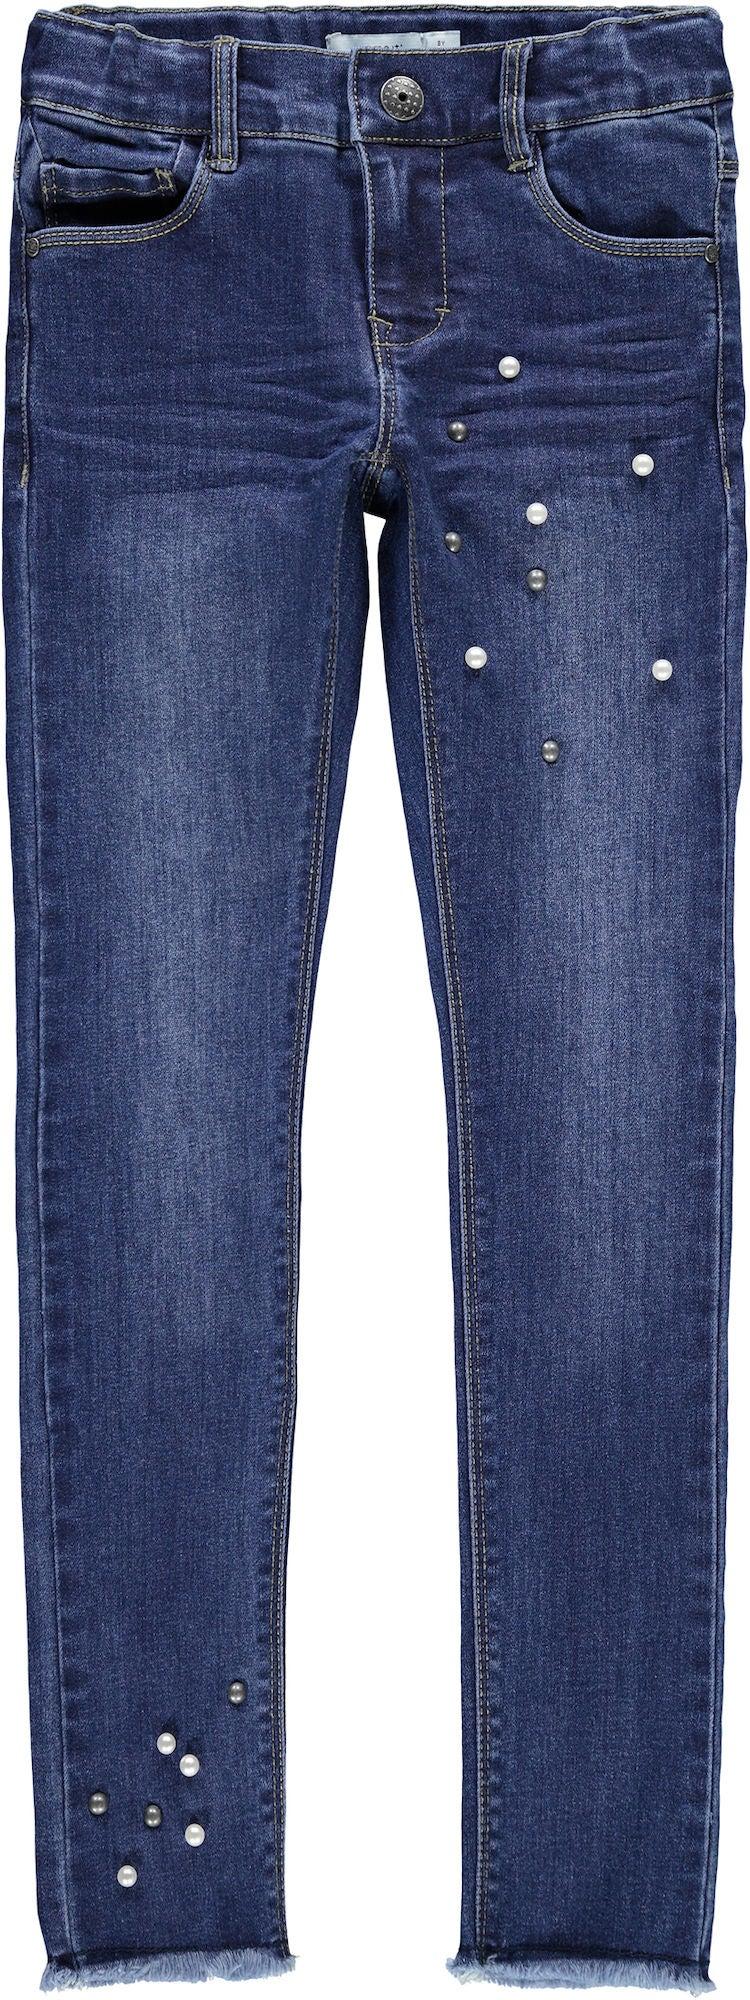 Name it Polly Jeans, Dark Blue Denim 152